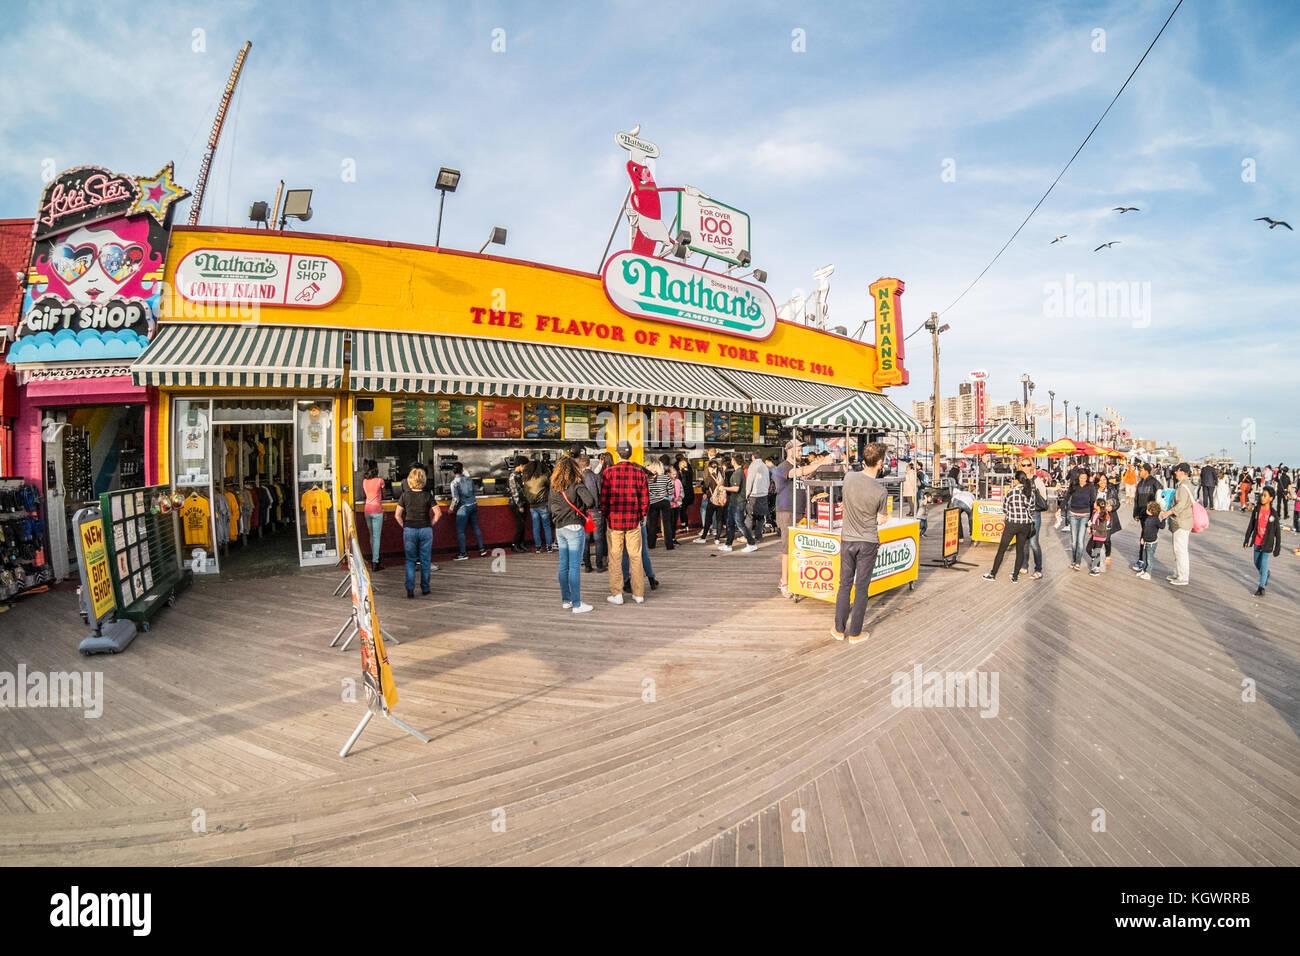 Coney Island Hot Dogs Miami Restaurant